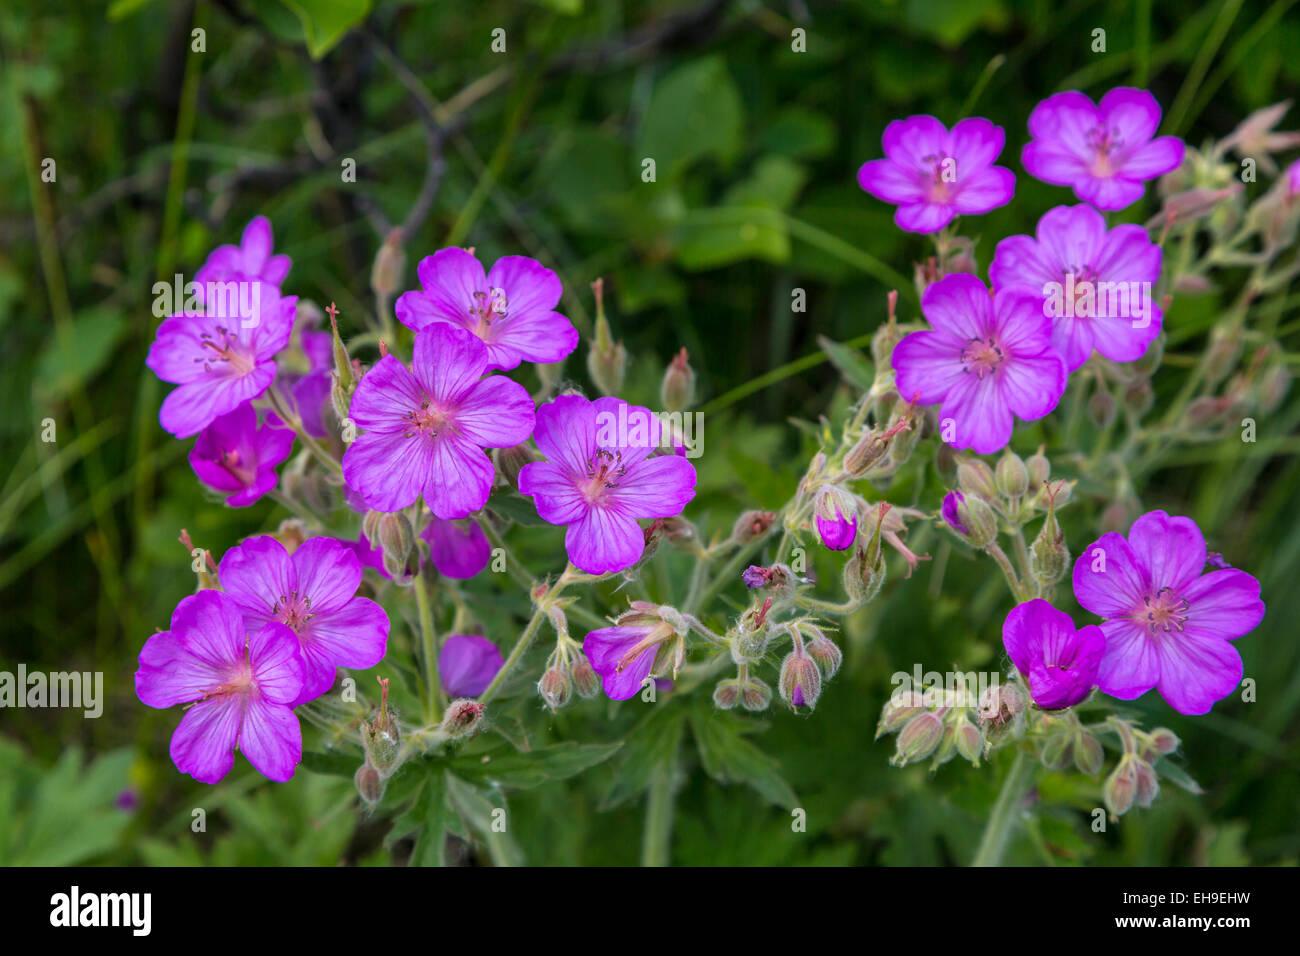 Sticky Geranium wildflowers in Waterton Lakes National Park, Alberta, Canada. - Stock Image